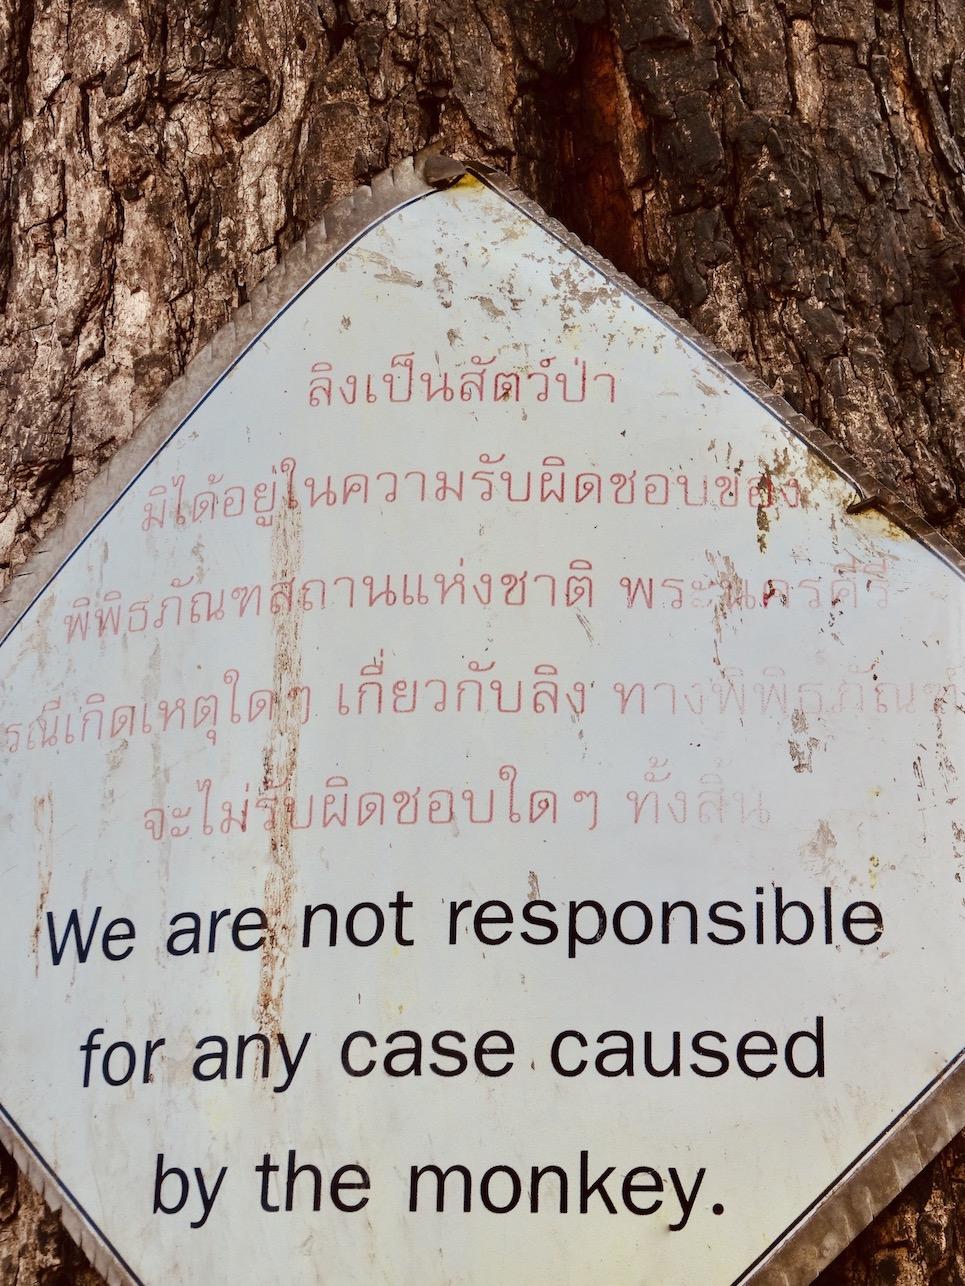 Beware of monkeys Phetchaburi Thailand